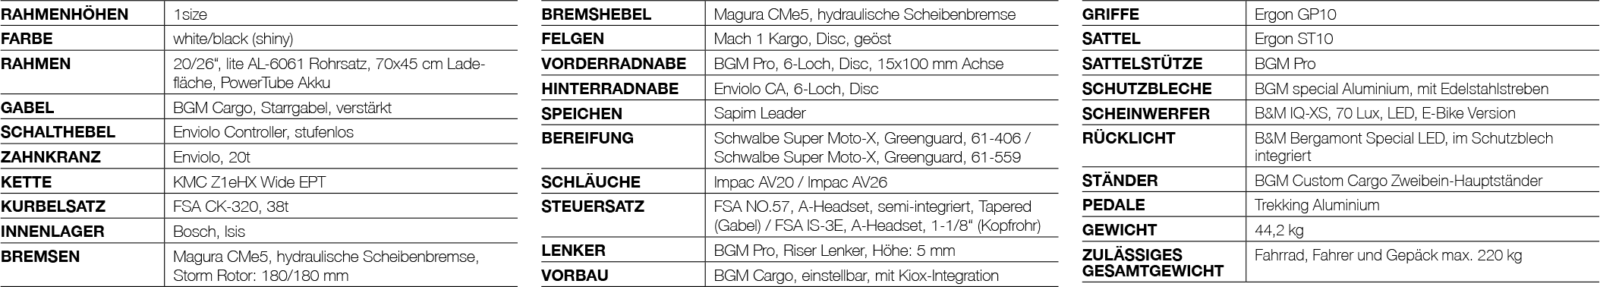 Cargoville Details